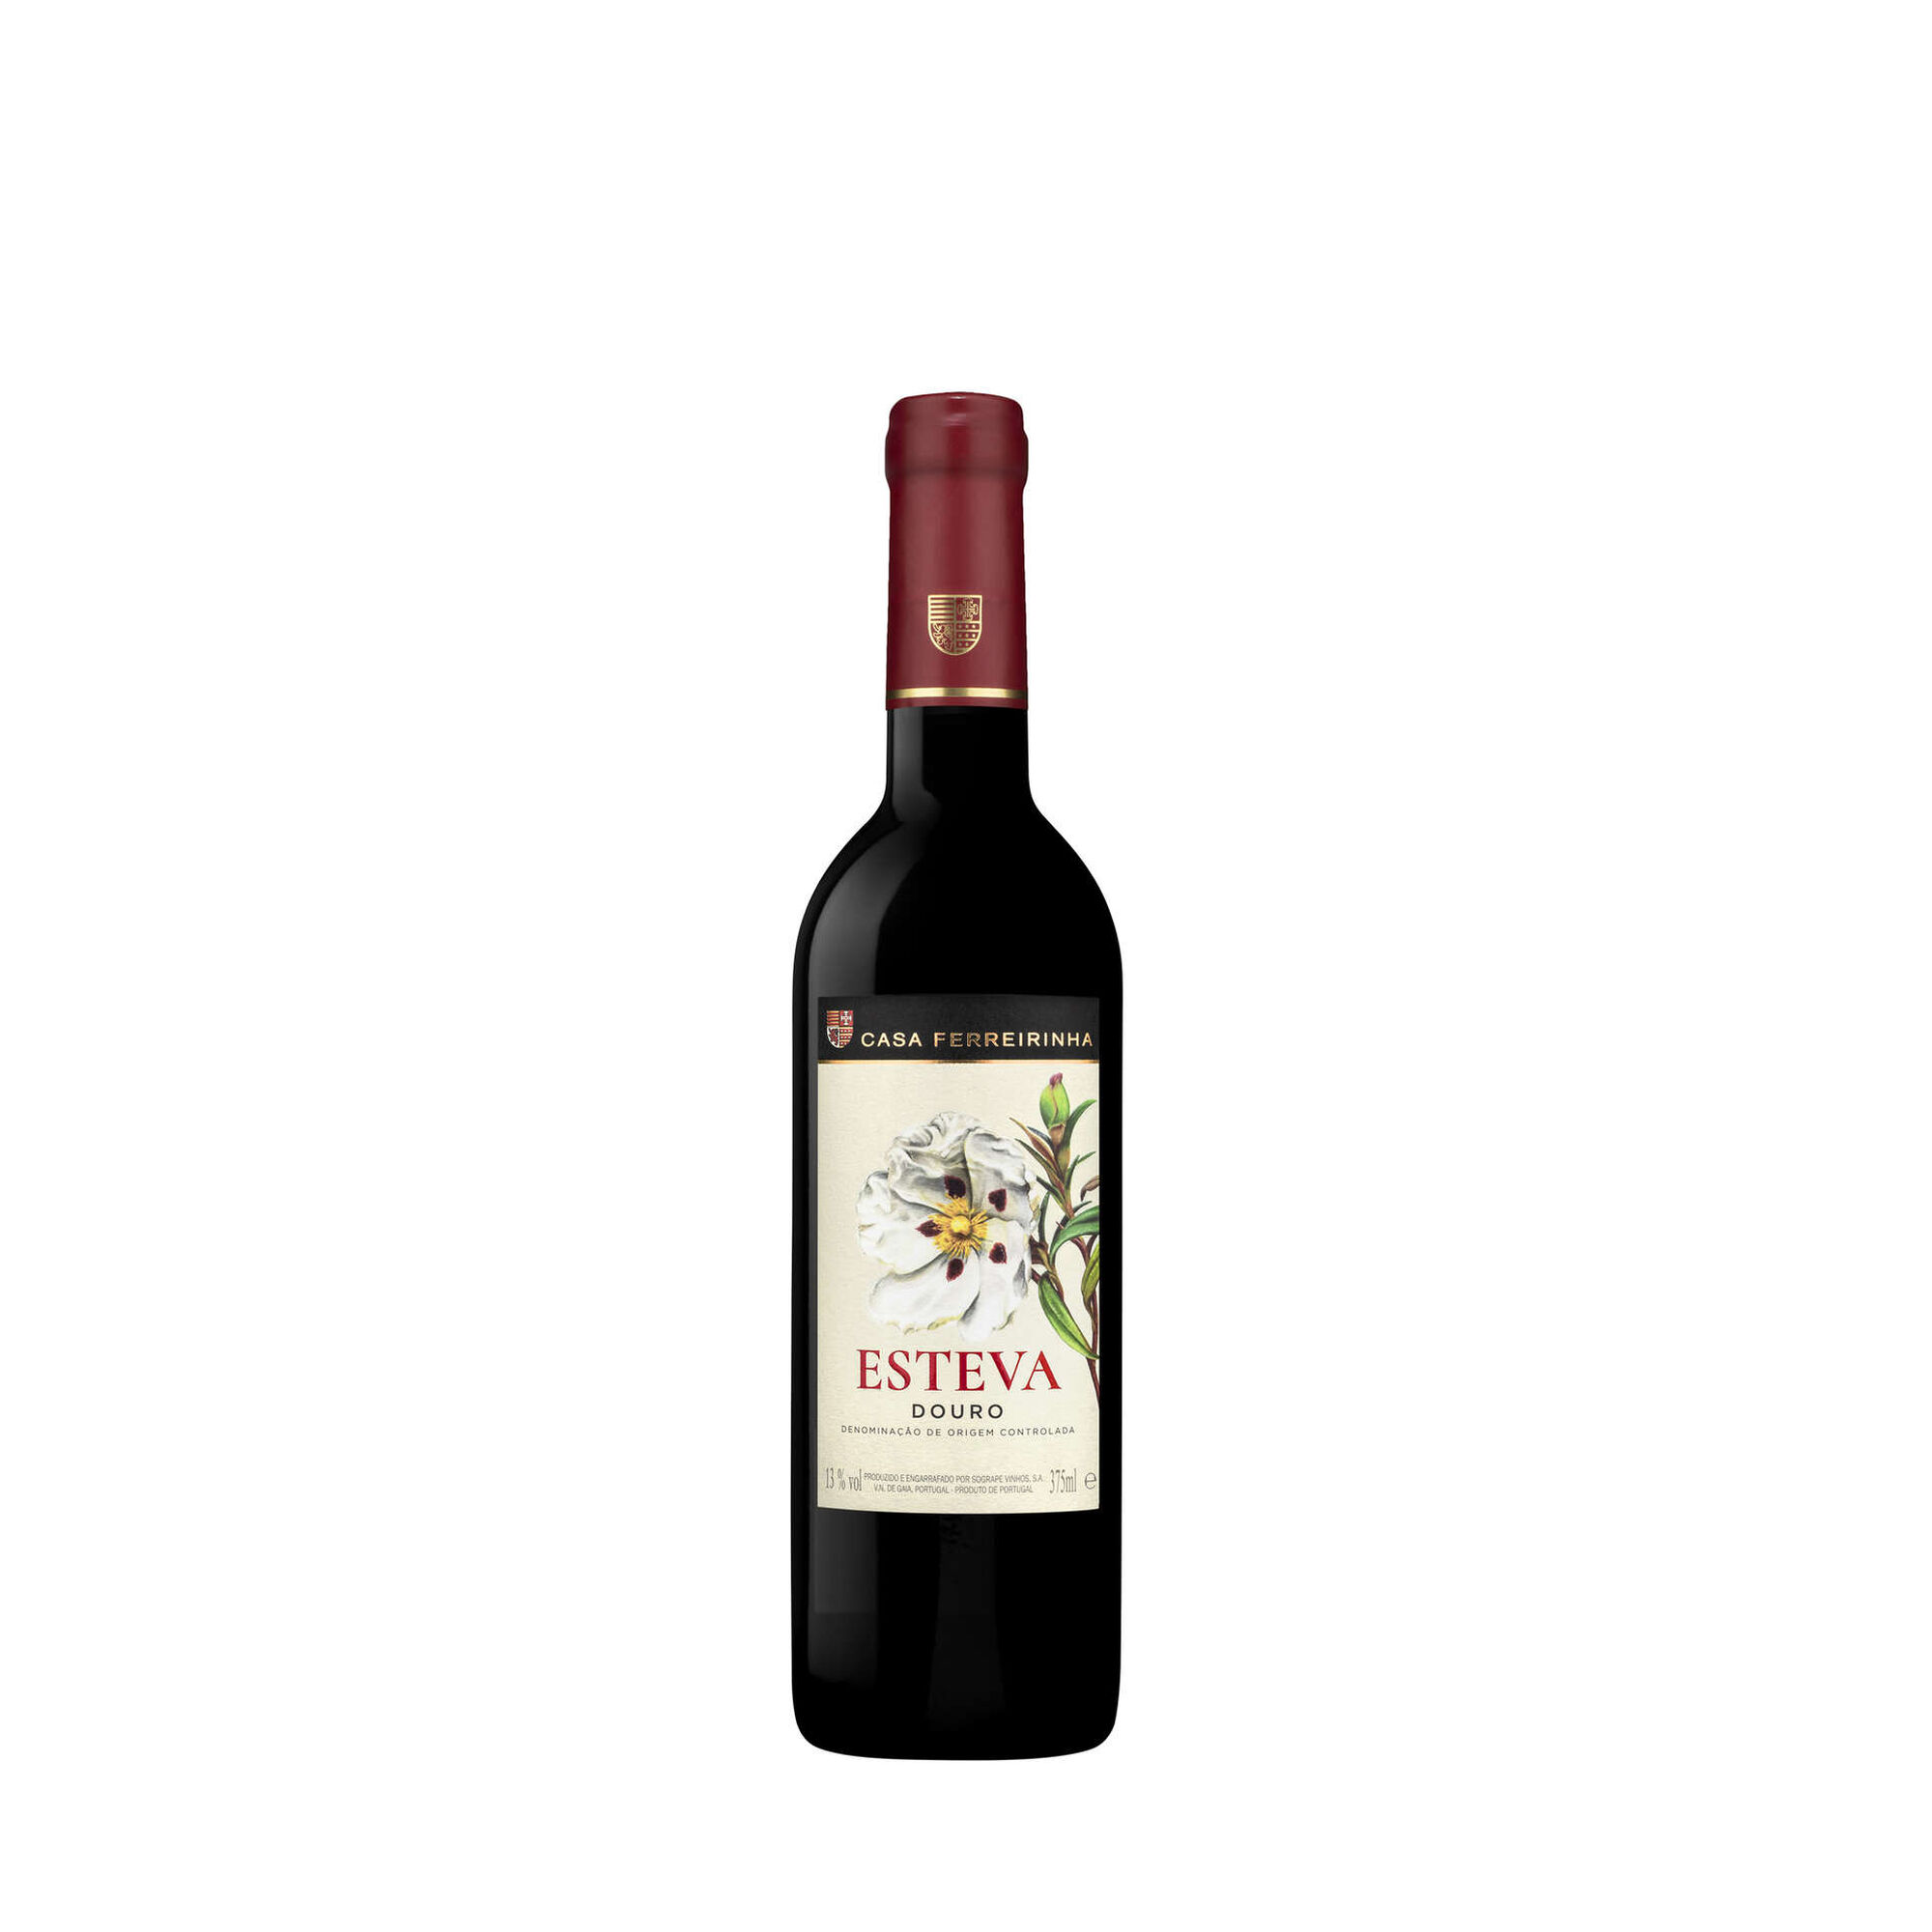 Esteva DOC Douro Vinho Tinto